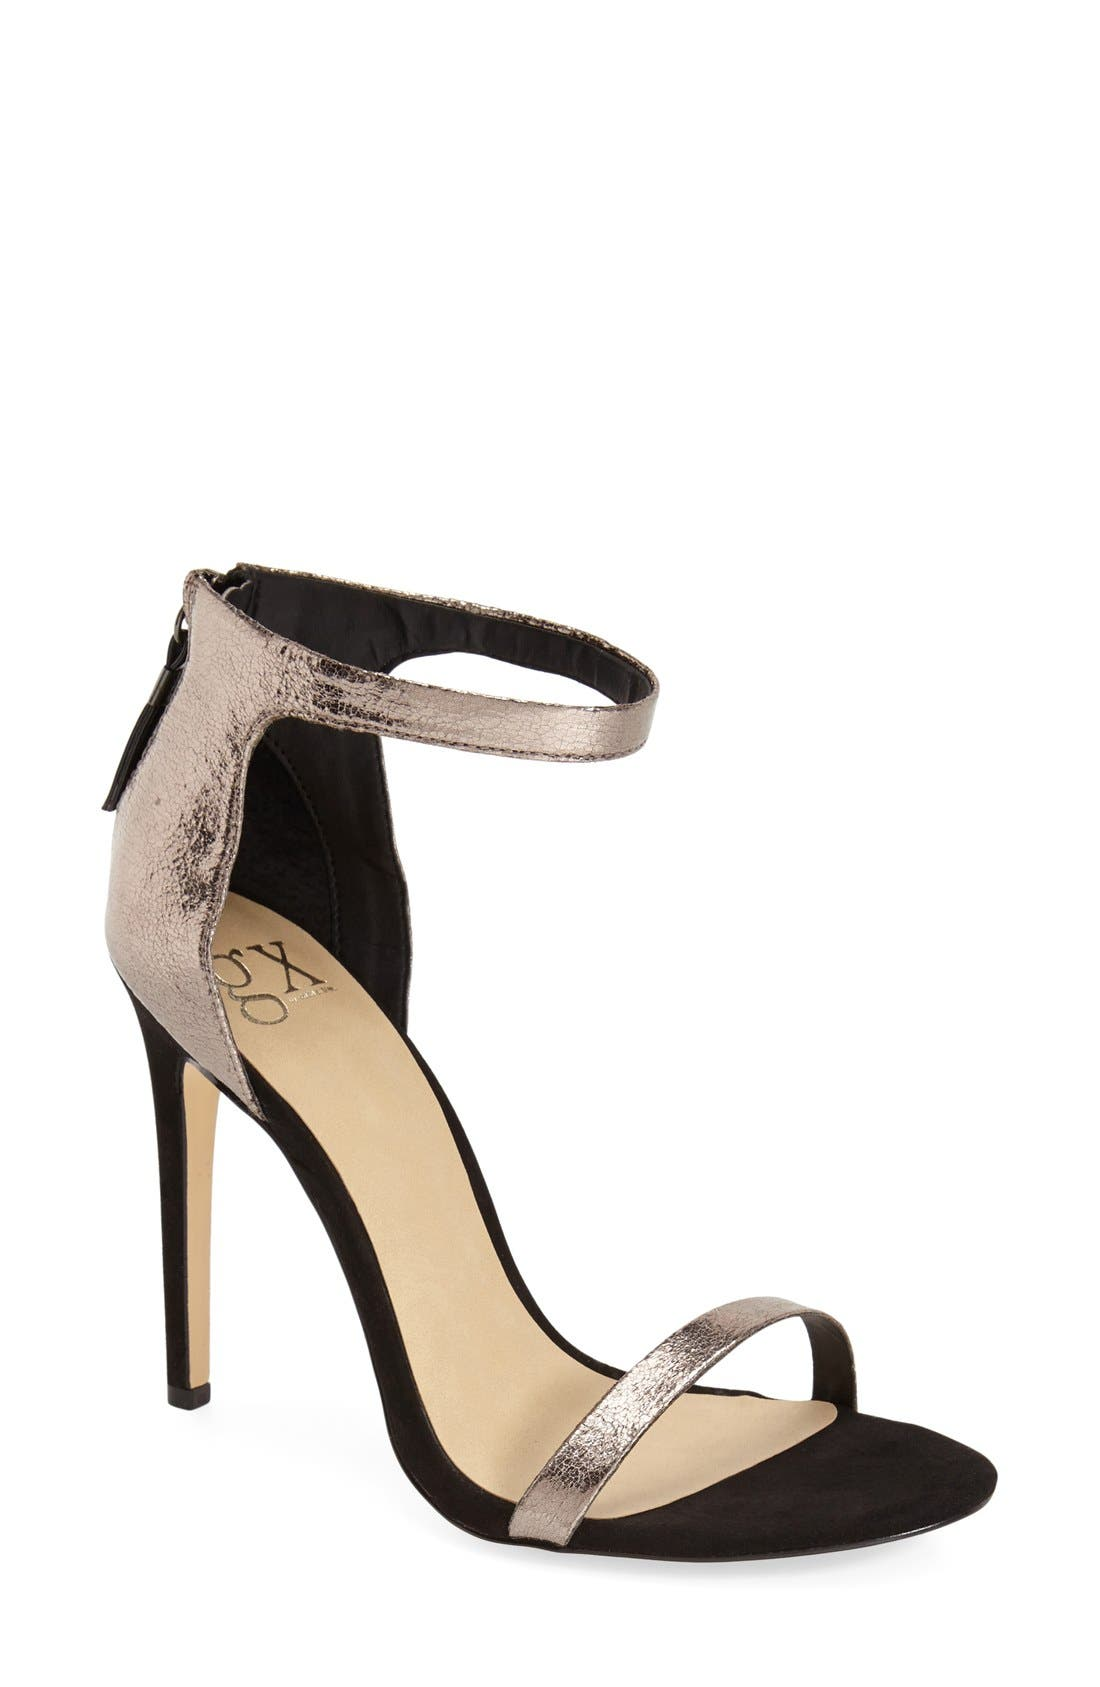 Alternate Image 1 Selected - gx by Gwen Stefani 'Observe' Ankle Strap Sandal (Women)